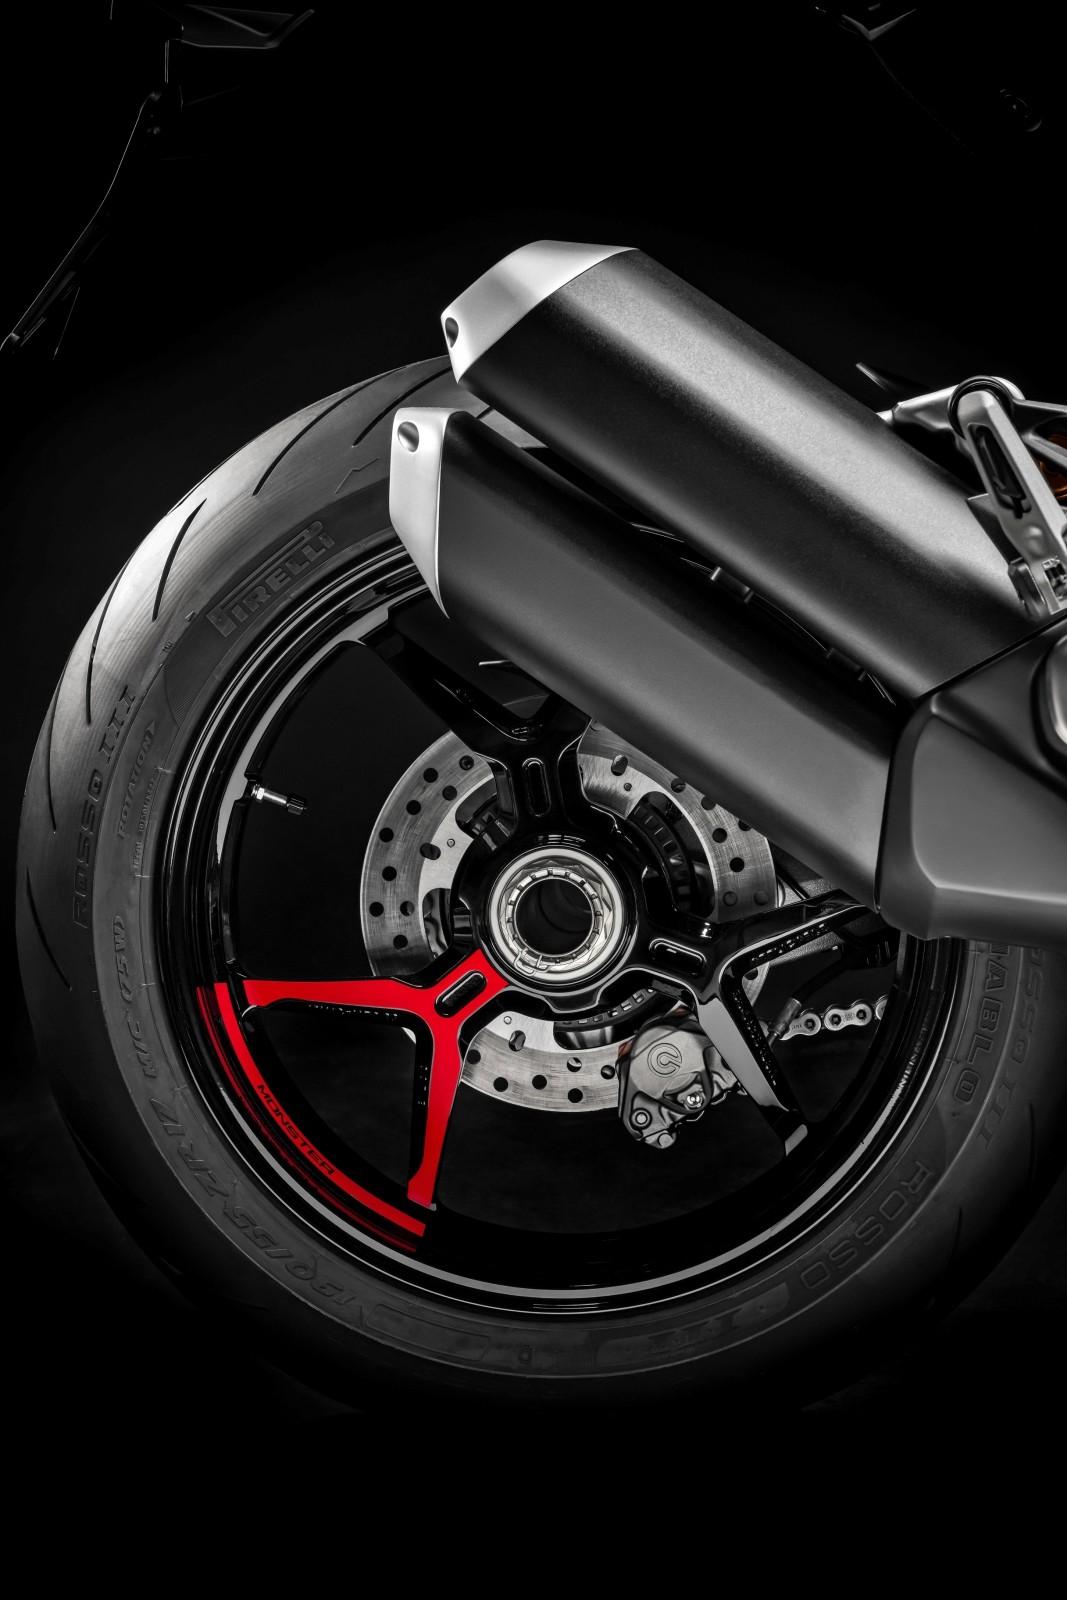 Foto de Ducati Monster 1200 S 2020 color negro (19/68)